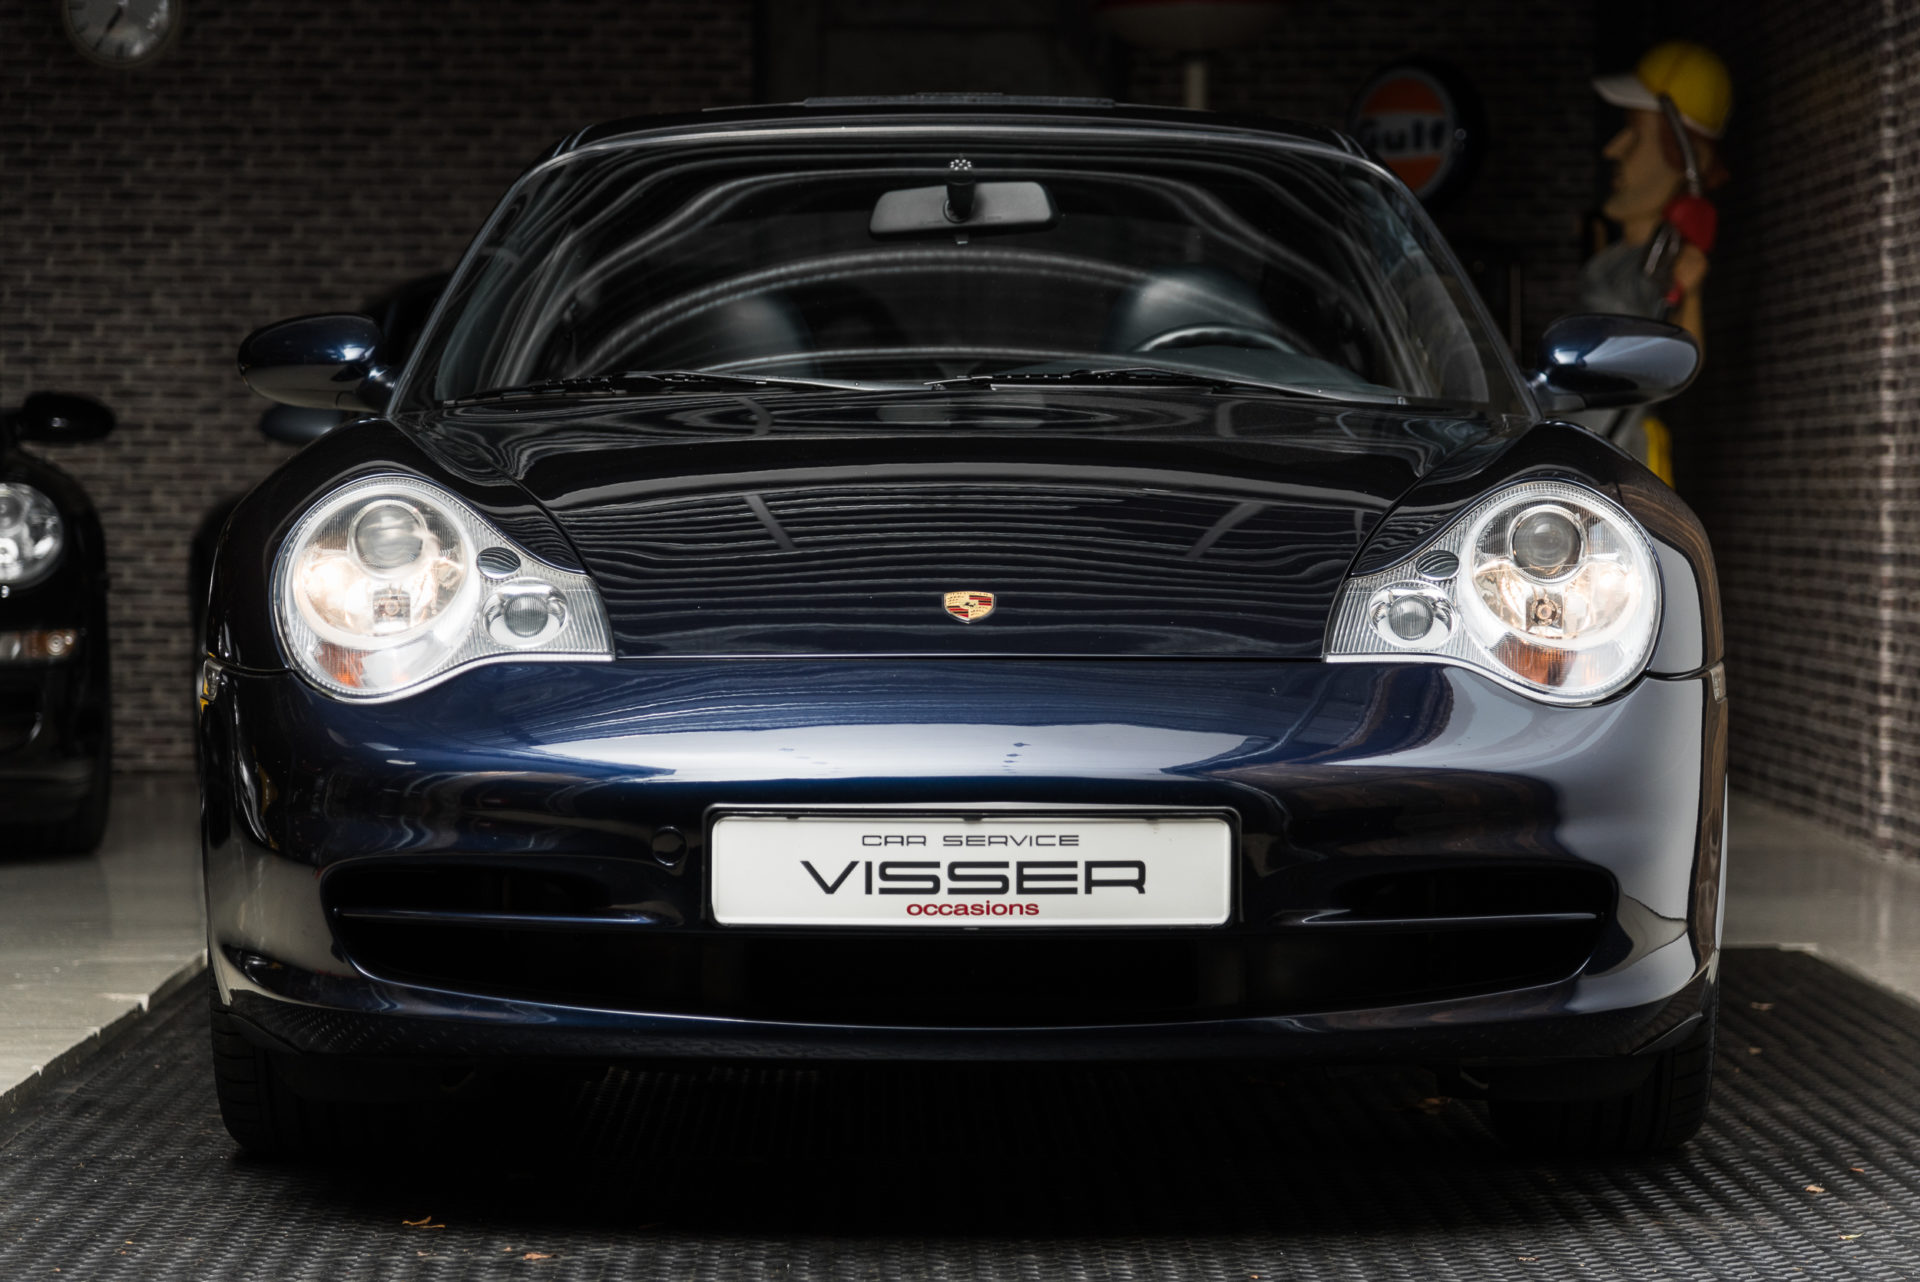 Porsche 996 Carrera 4 - 25